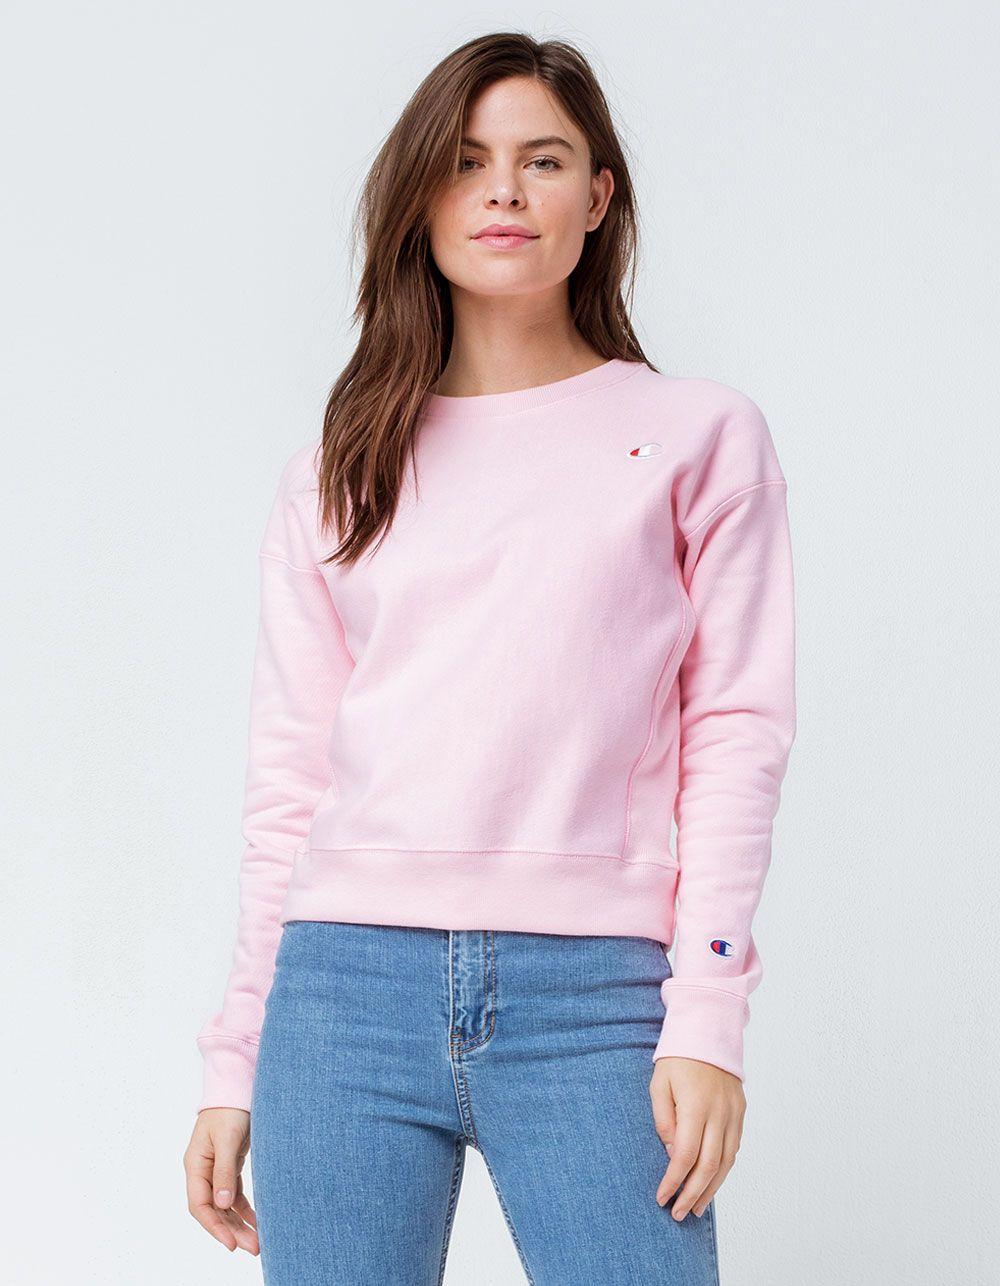 Champion Life Reverse Weave Pink Womens Sweatshirt Pink Ladies Sweatshirt Sweatshirts Women Pink Champion Sweatshirt [ 1286 x 1000 Pixel ]